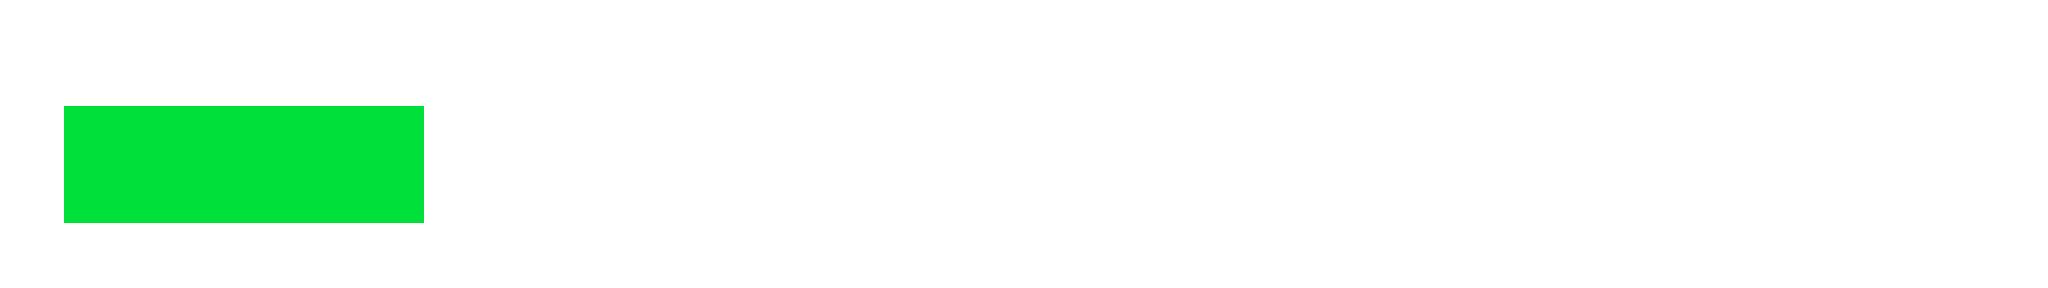 MAINOS logo